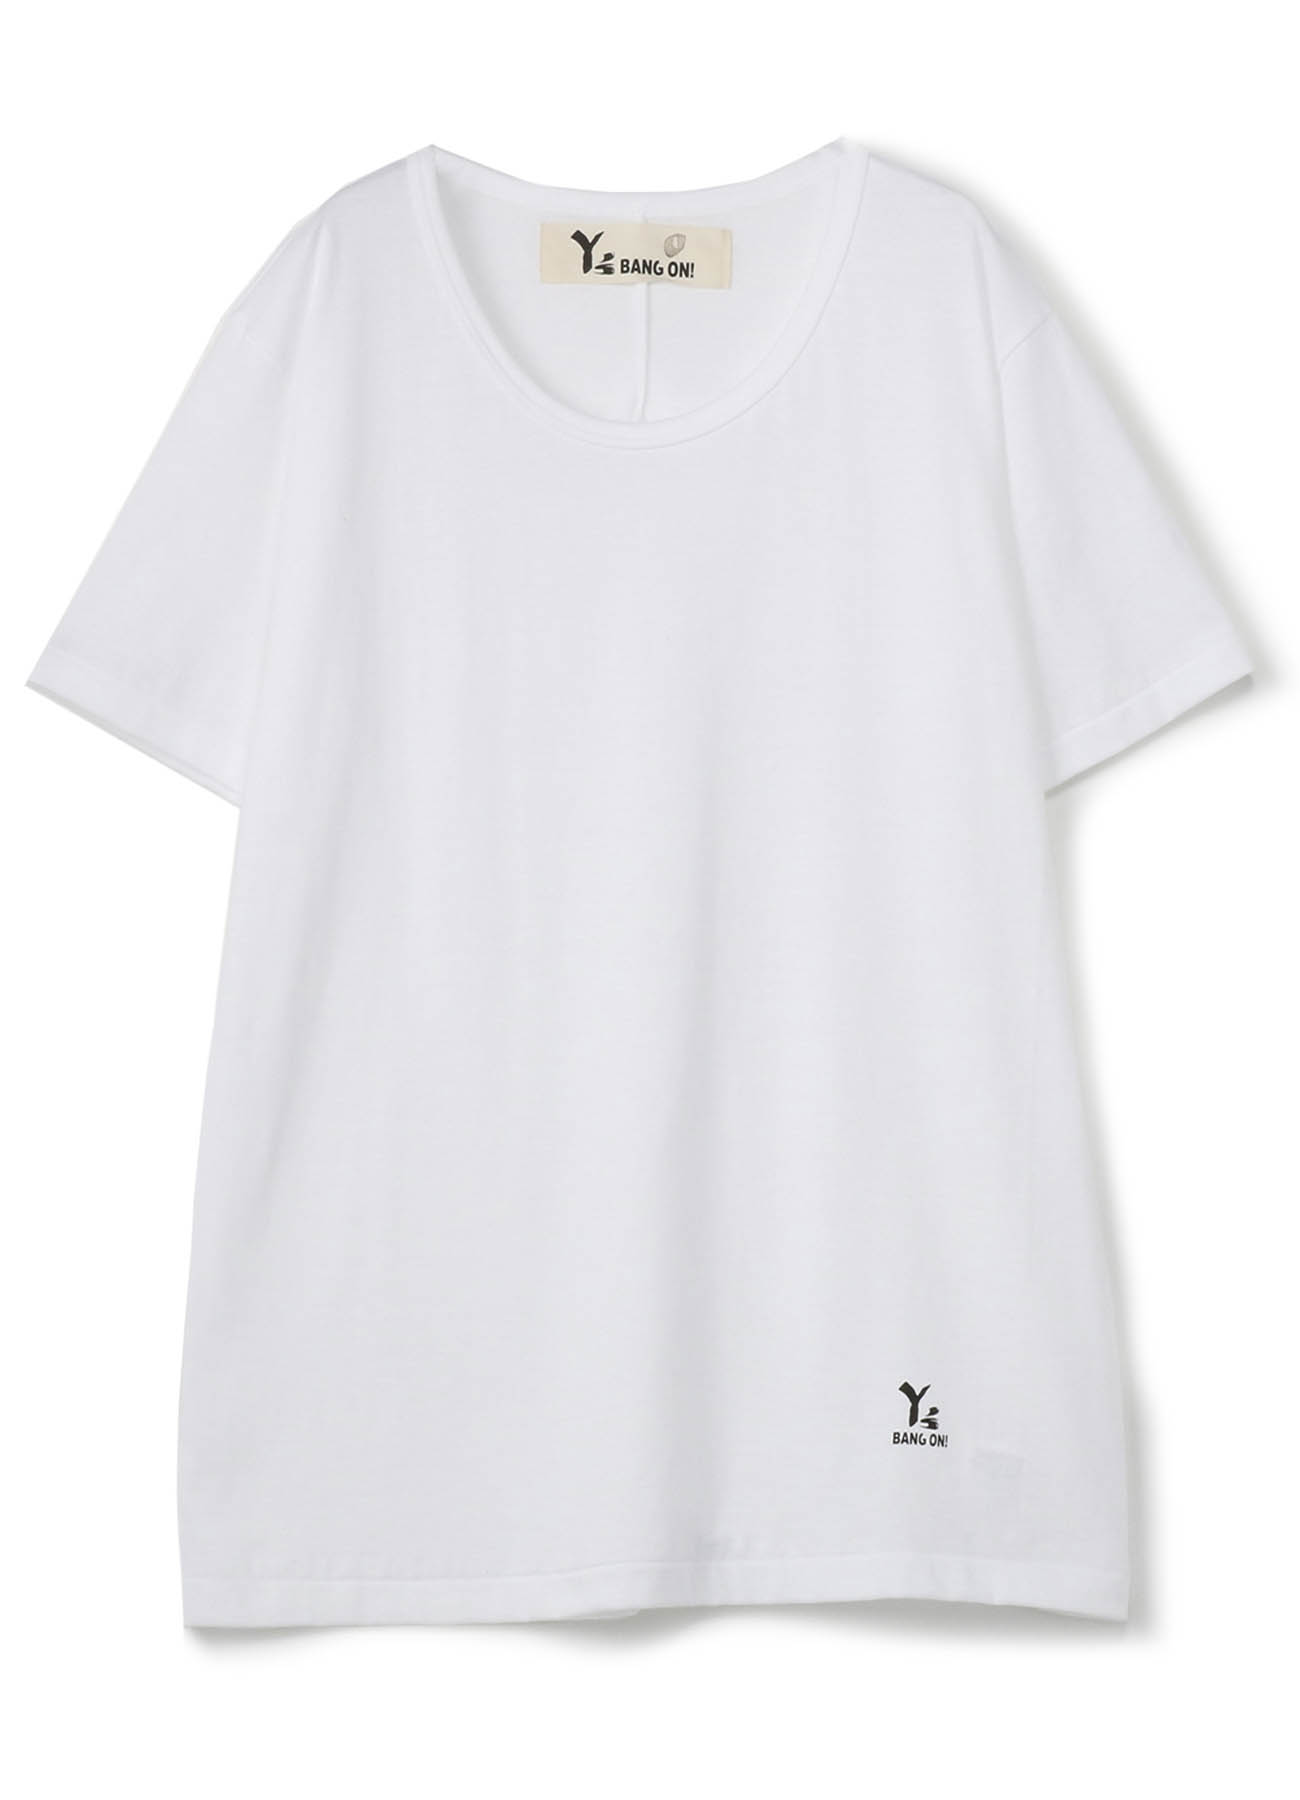 BANG ON! Uネック半袖Tシャツ